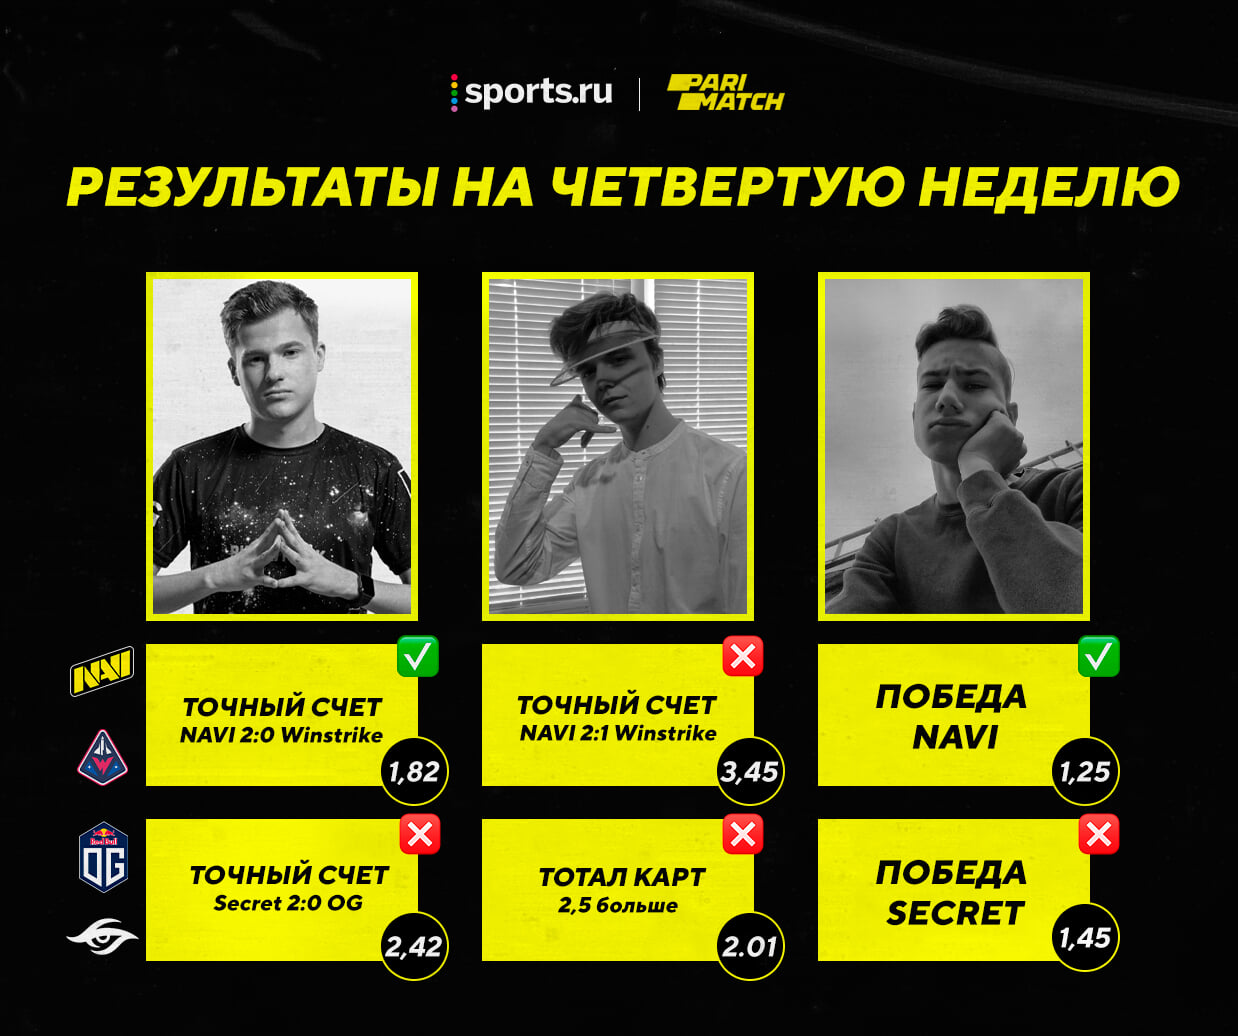 Ставки, Nigma, DPC Европа: DreamLeague S15, Team Spirit, Ставки на киберспорт, Virtus.pro, DPC СНГ: ESL One CIS Online, OG